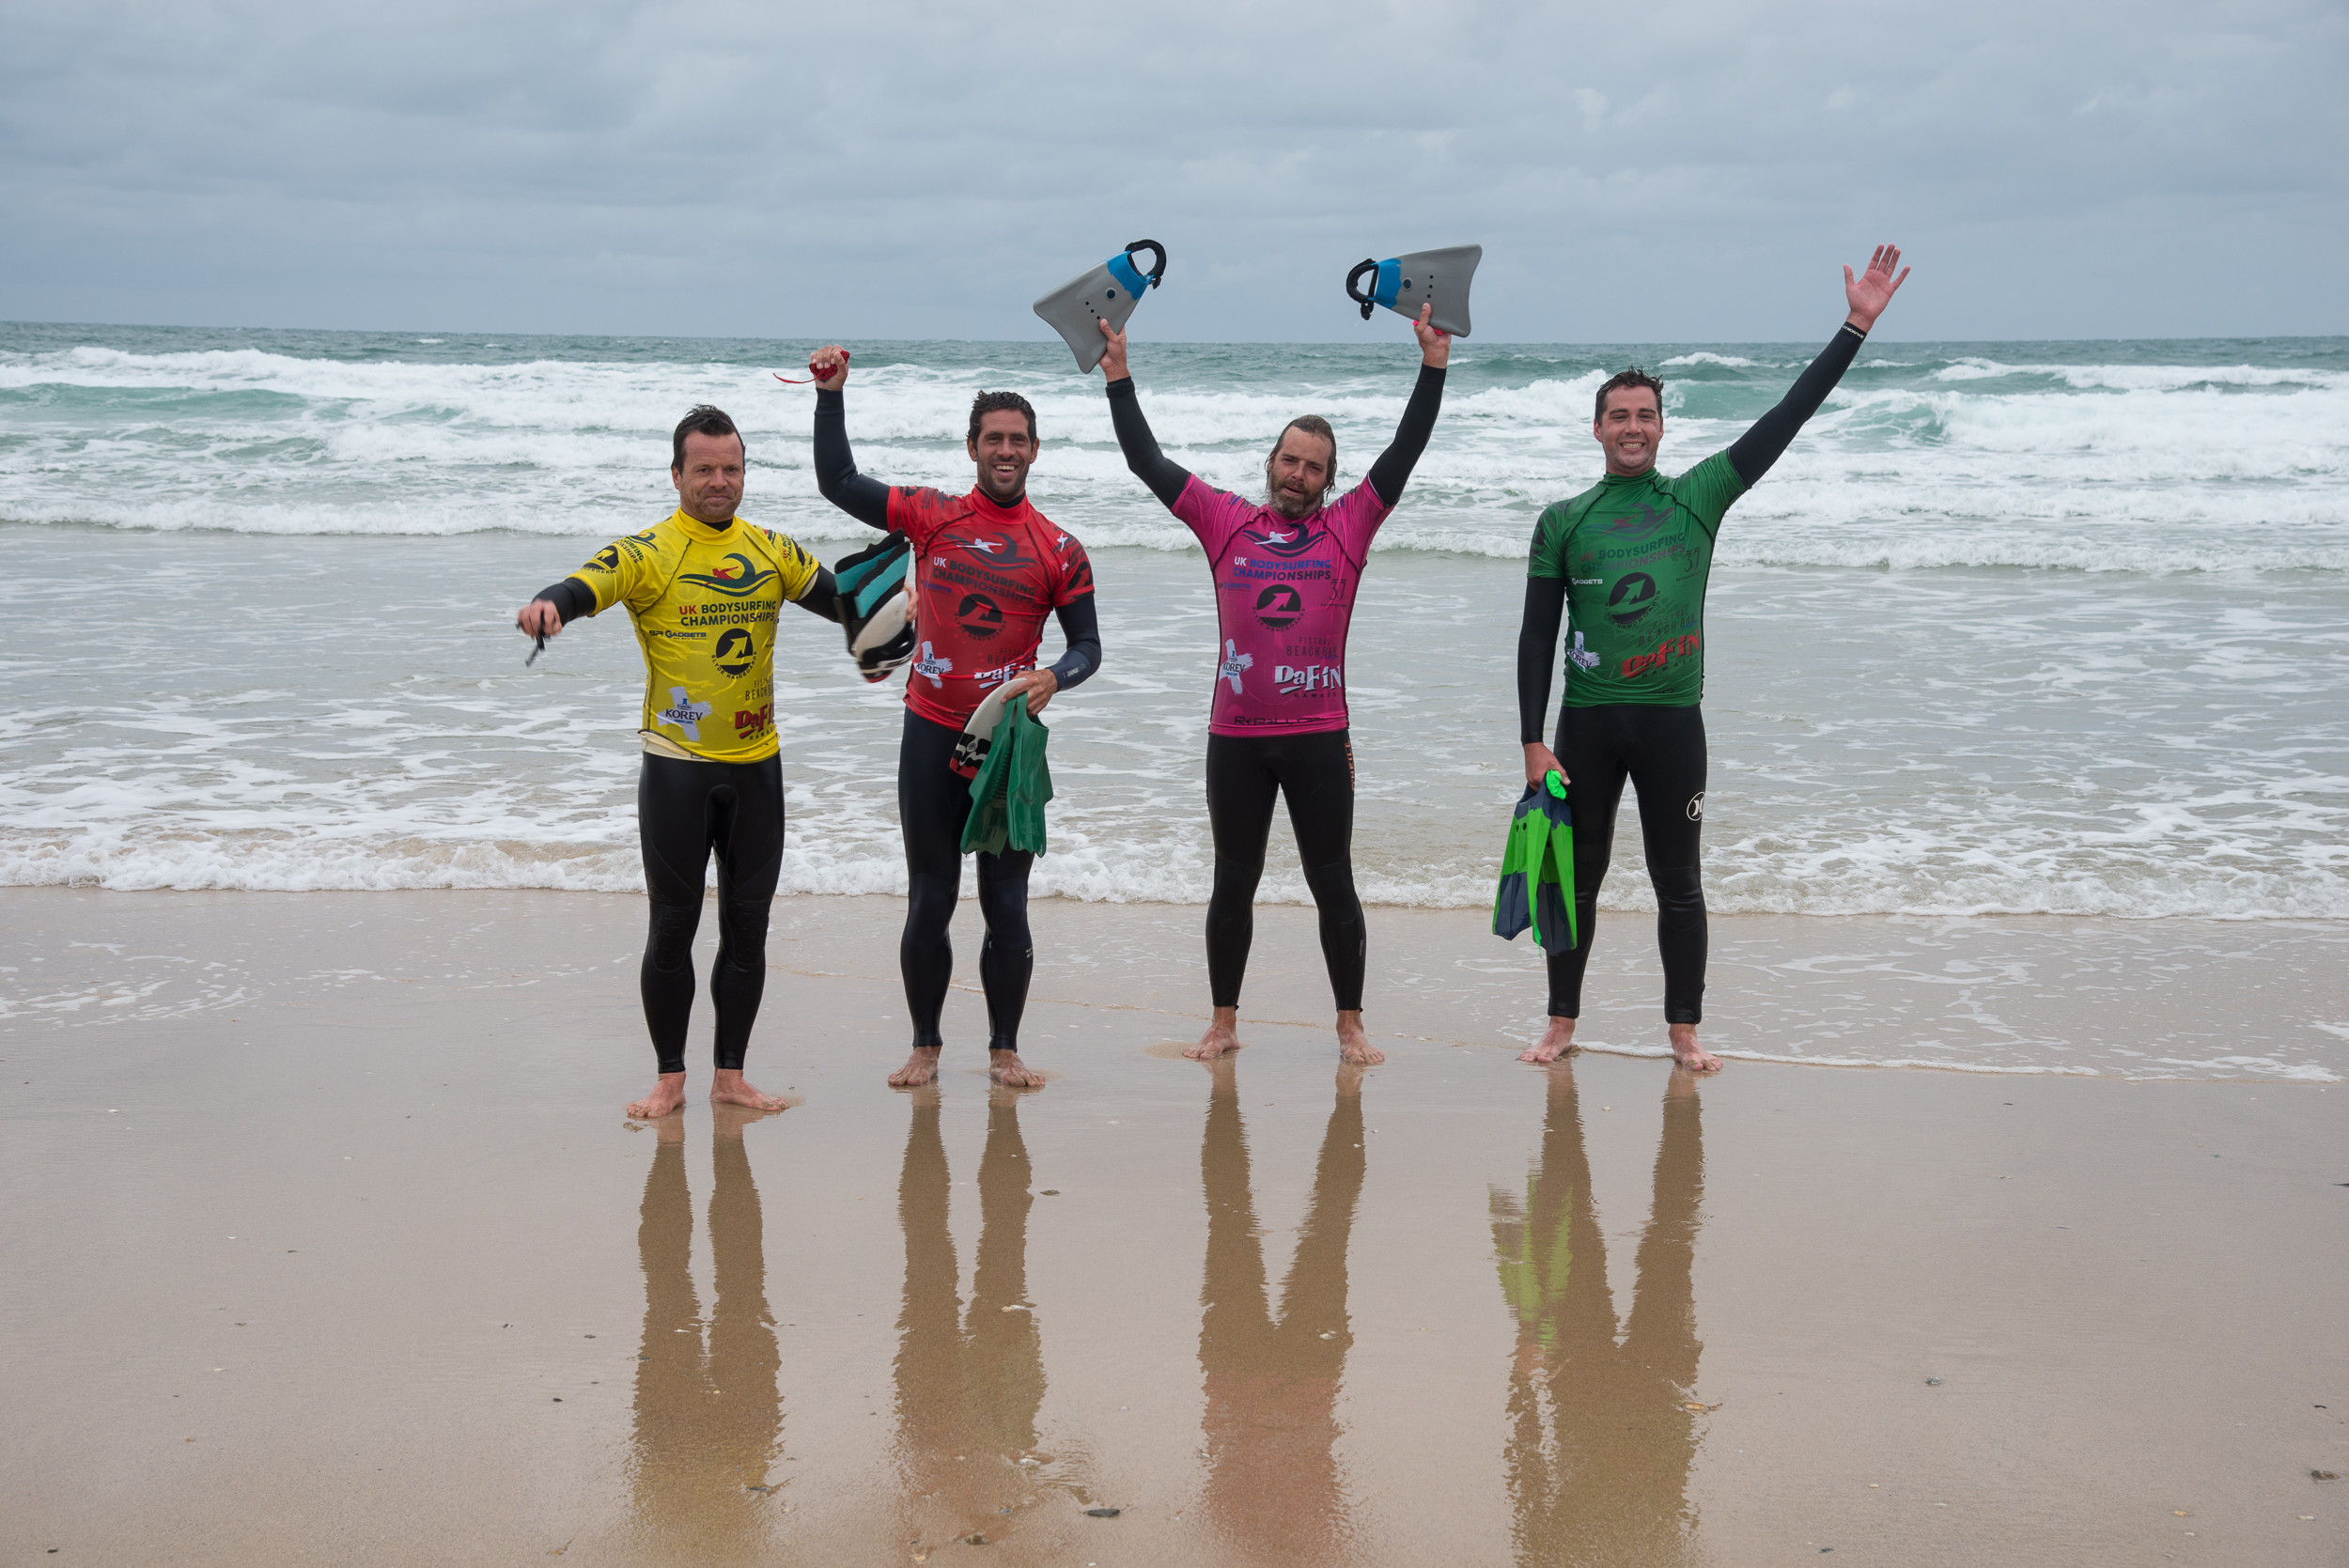 Slyde Handboards UK Bodysurfing Championships 2017